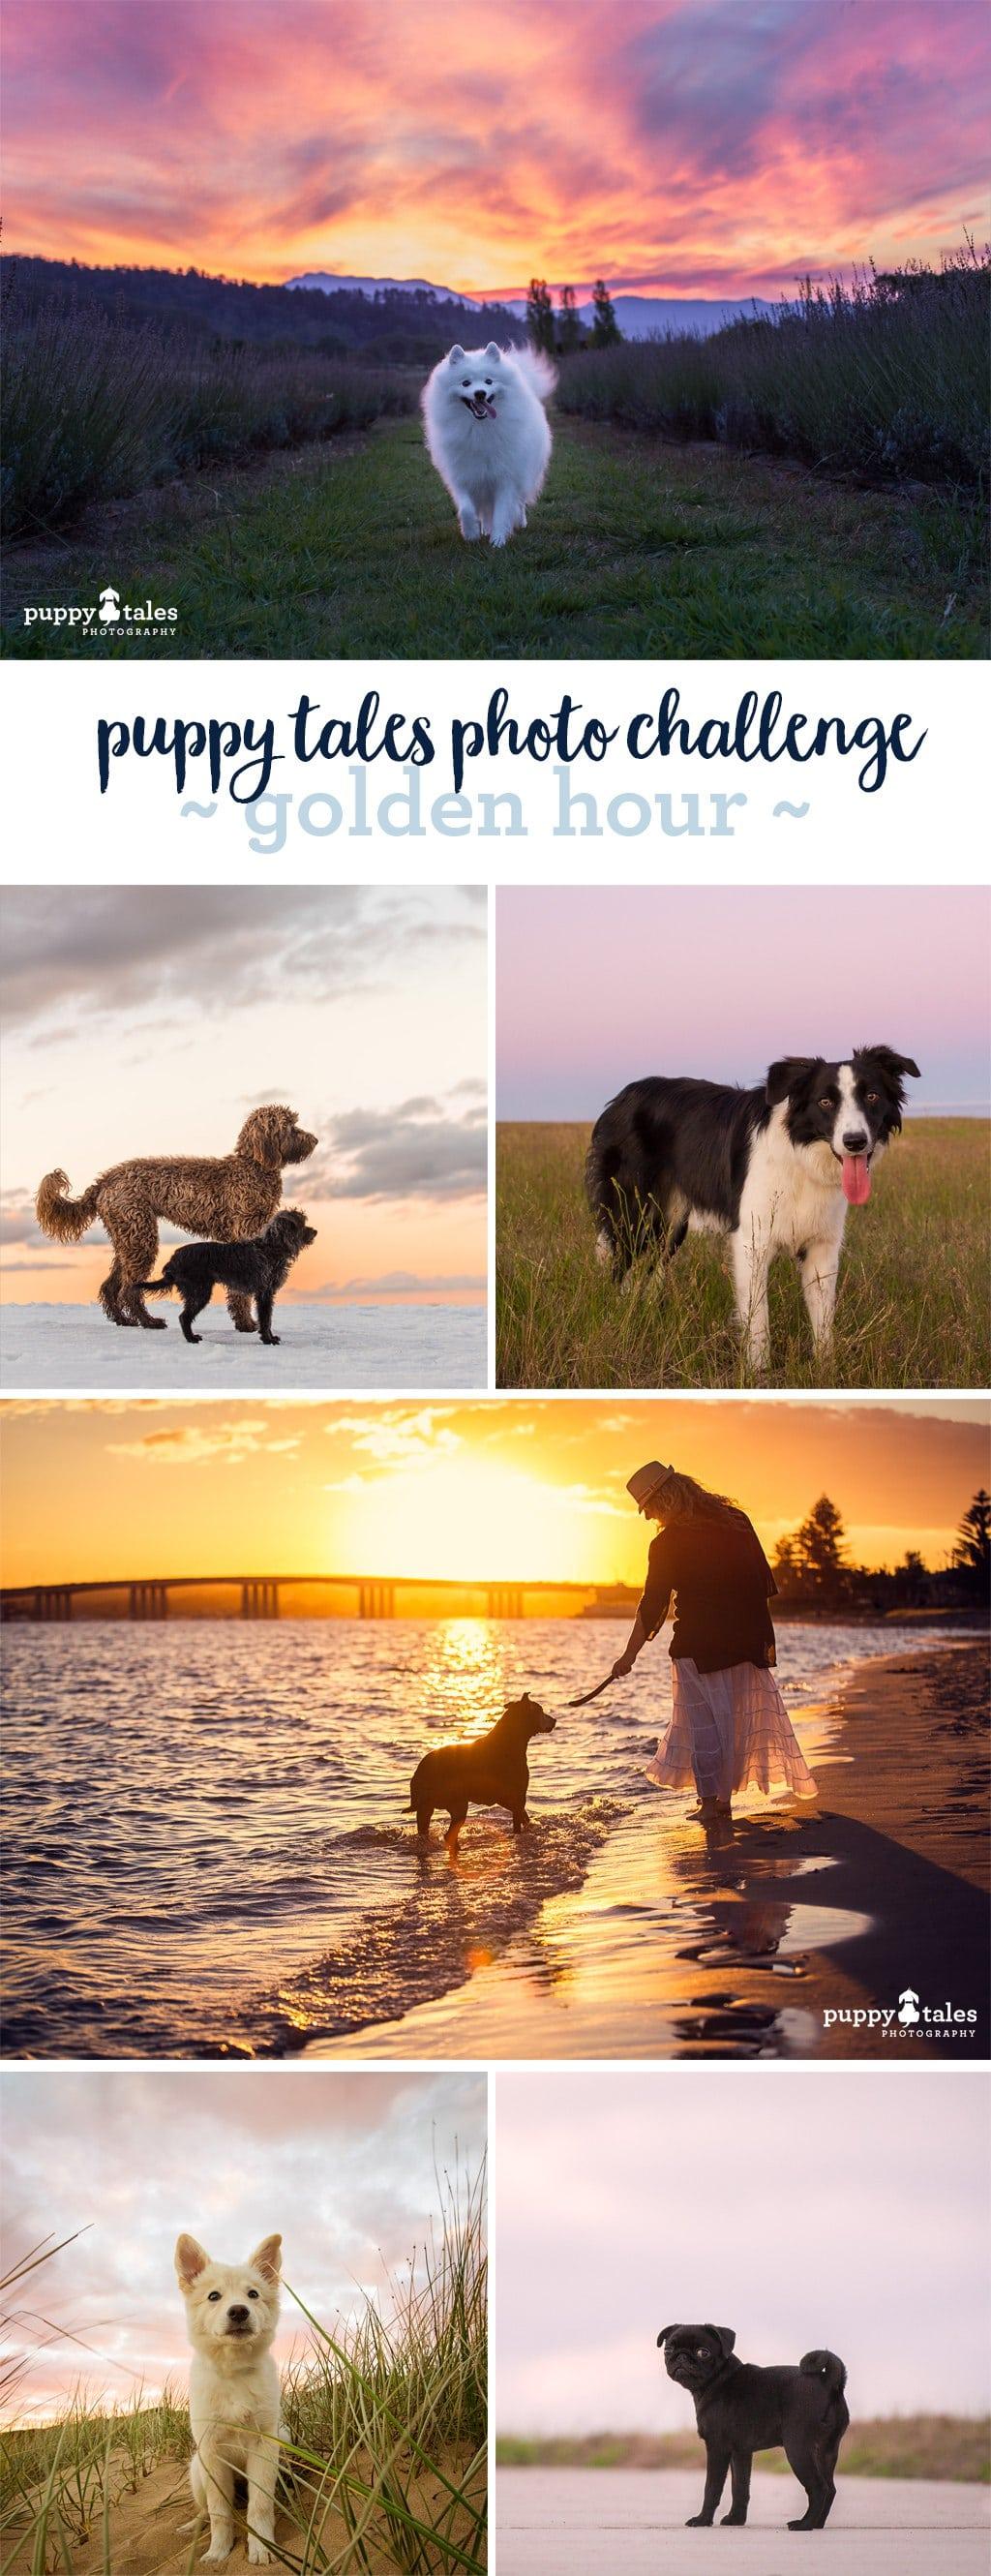 Puppy Tales Photo Challenge - Golden Hour